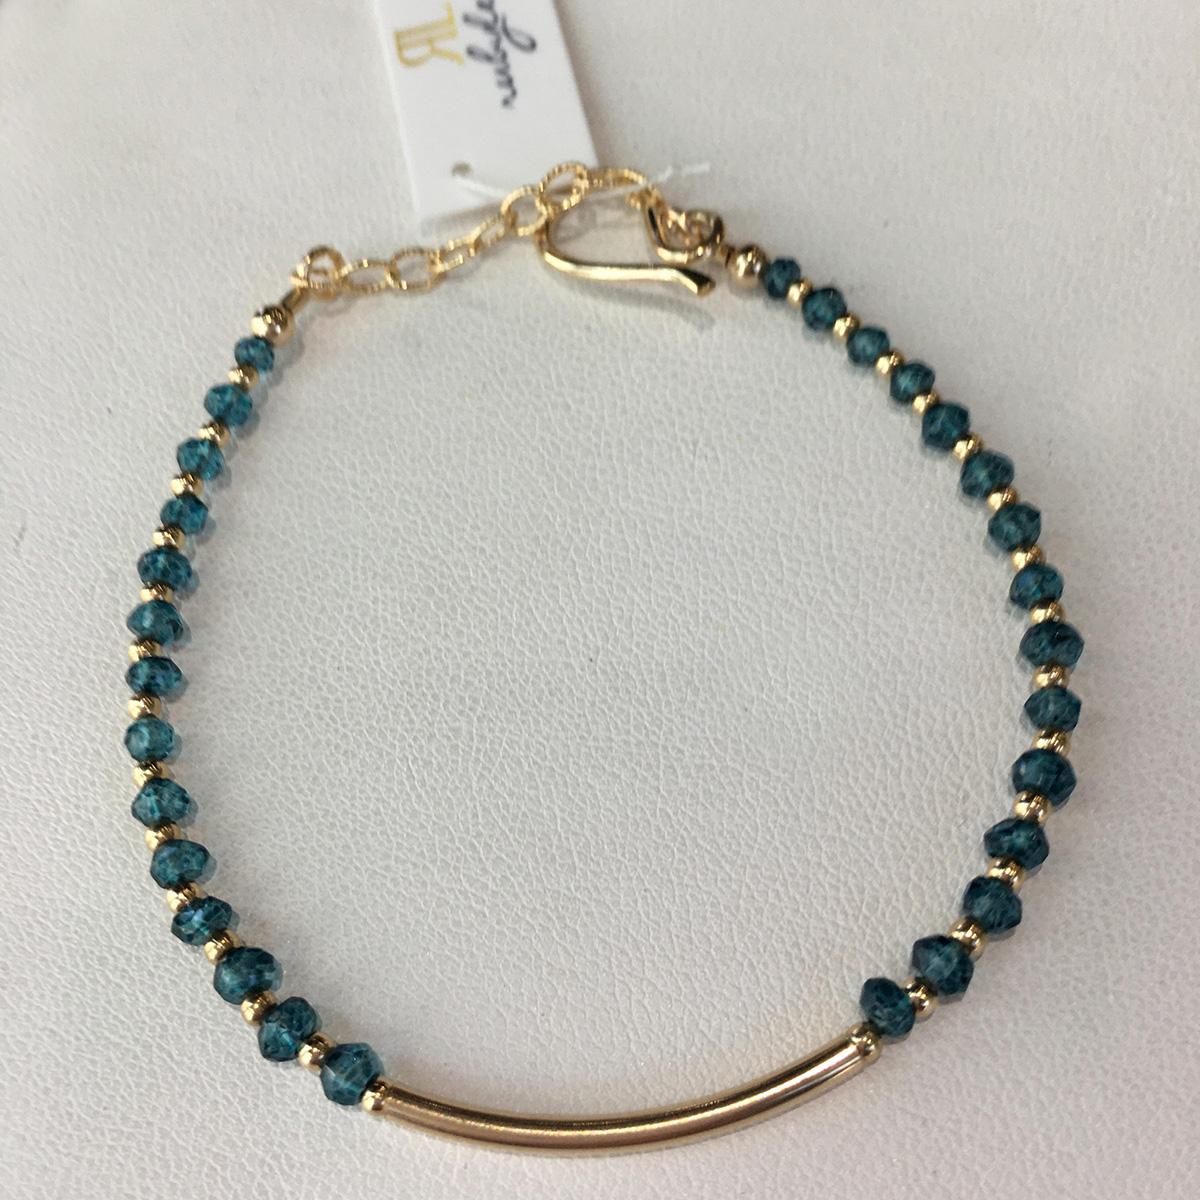 Ruby Lena Gemstone Bracelet with Tube Center